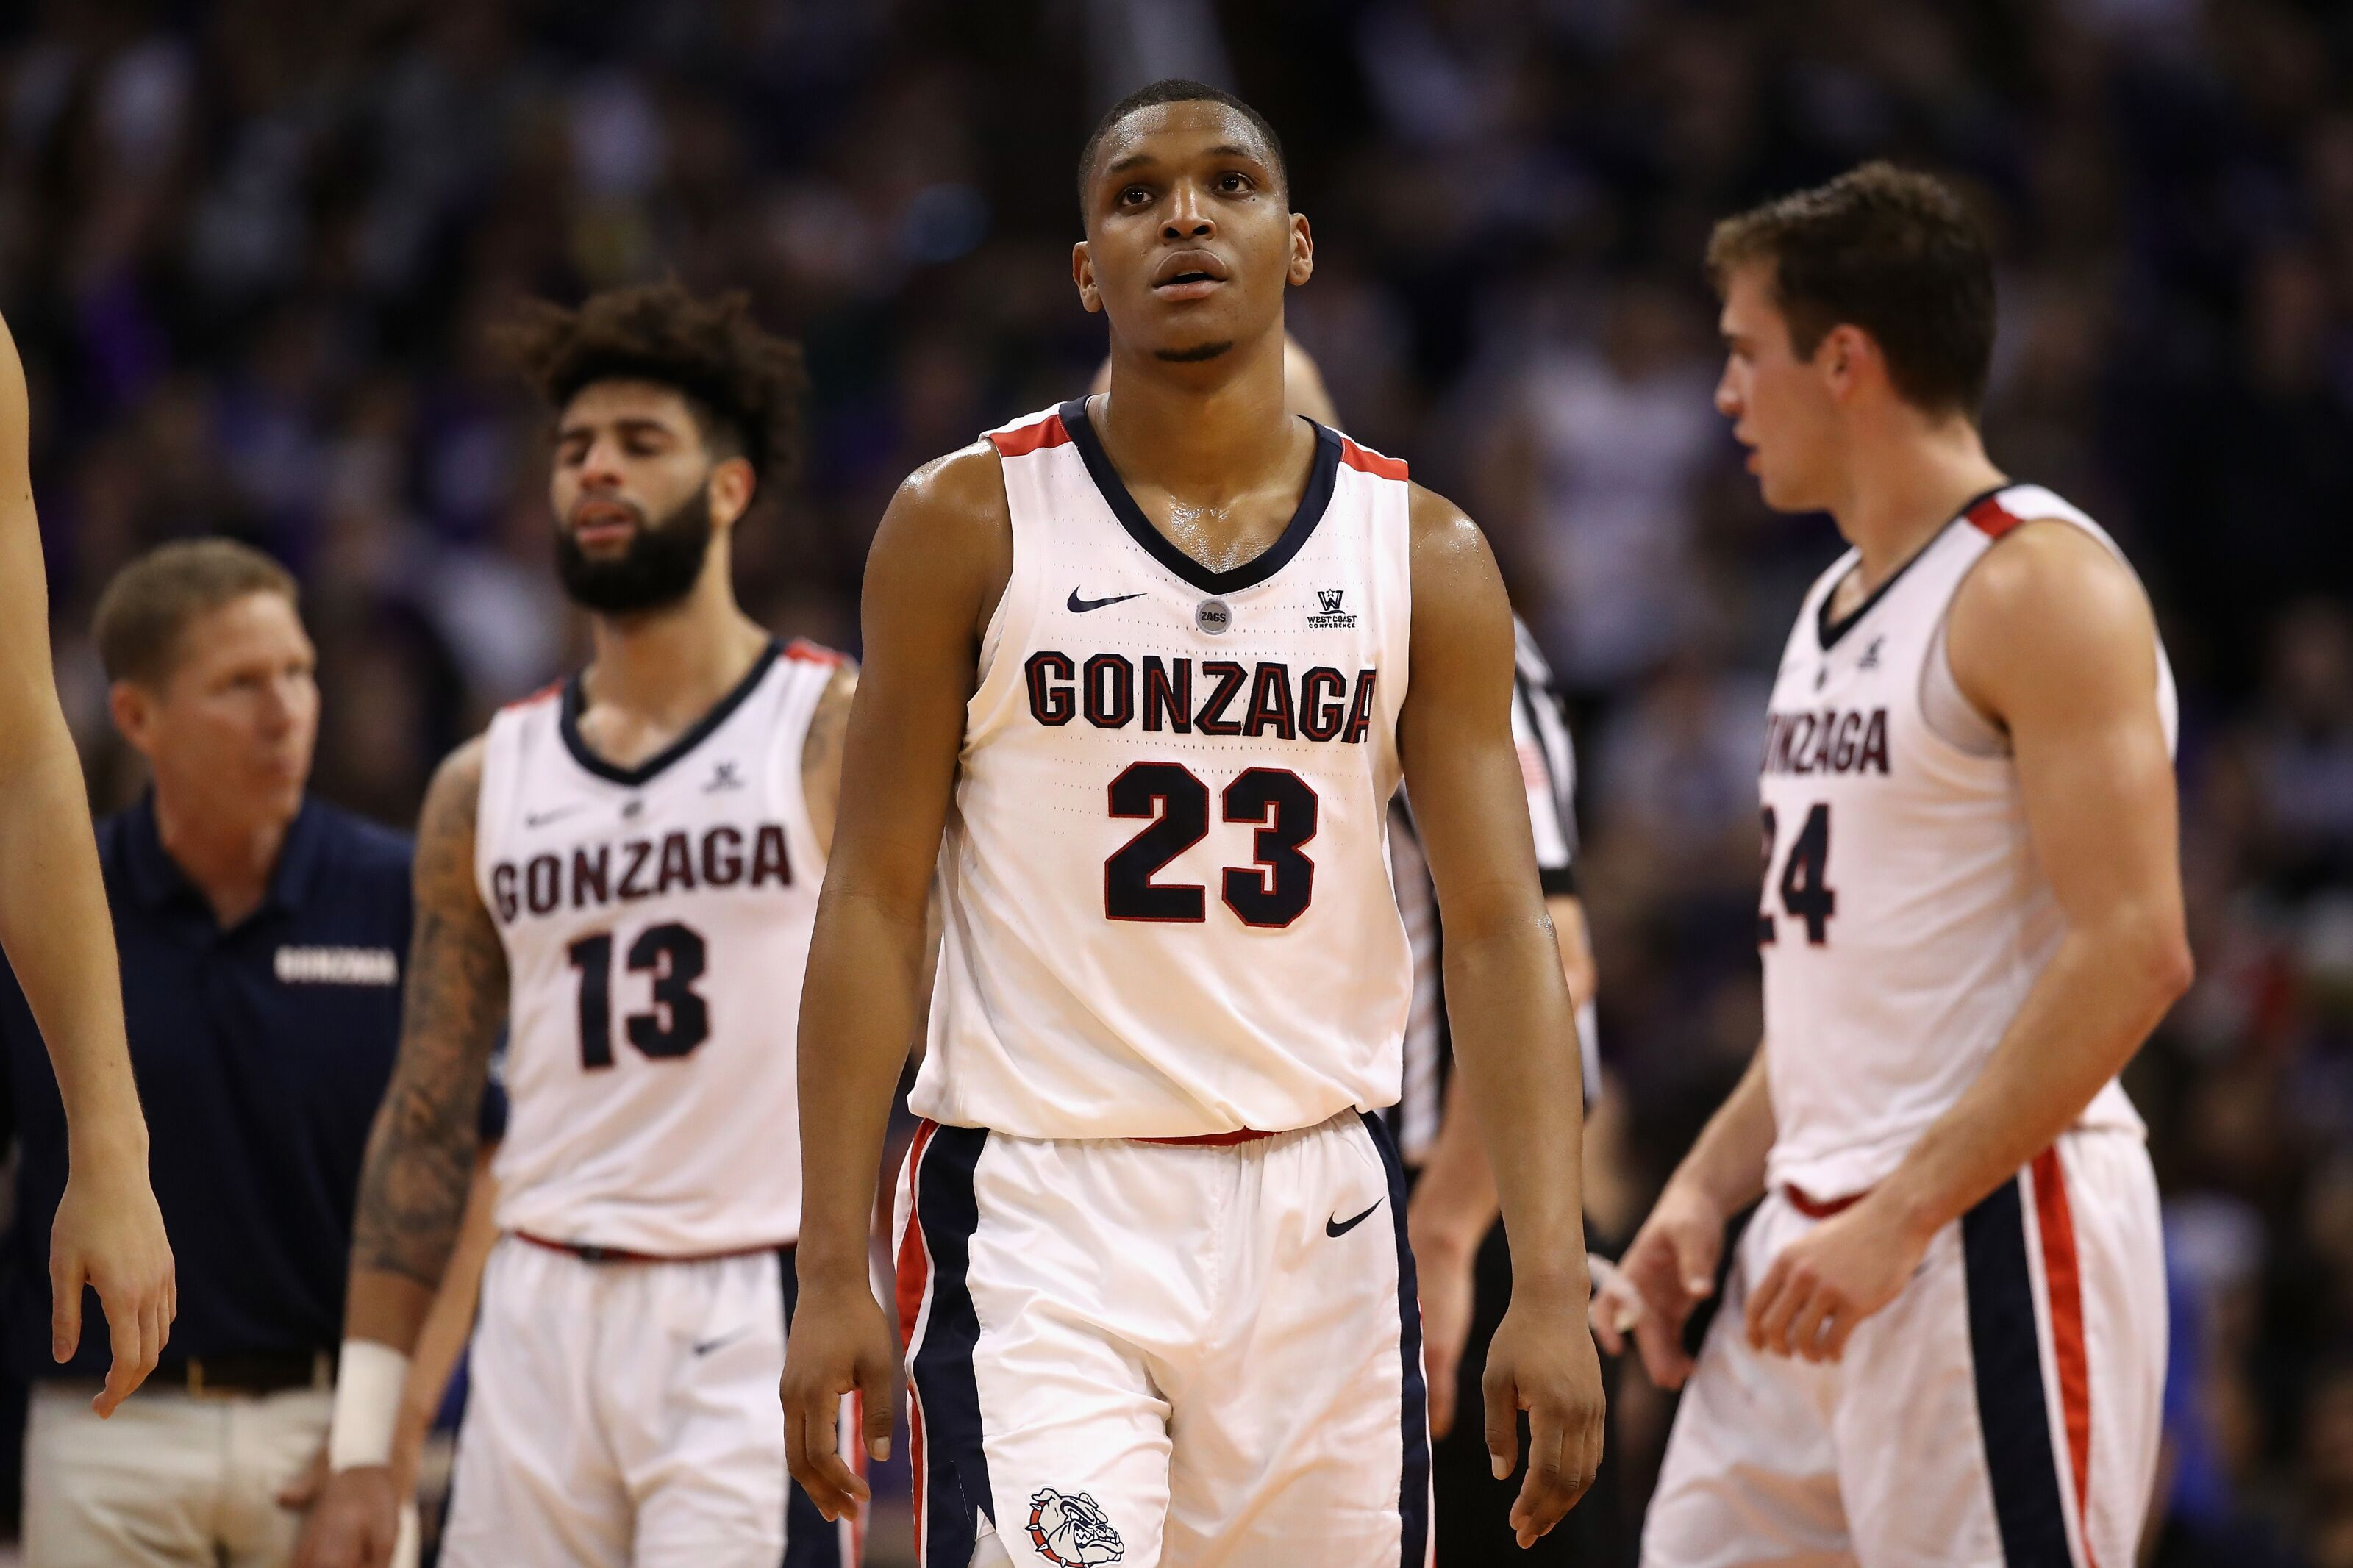 2019 NCAA Tournament: Gonzaga, Virginia, and Duke under most pressure to win